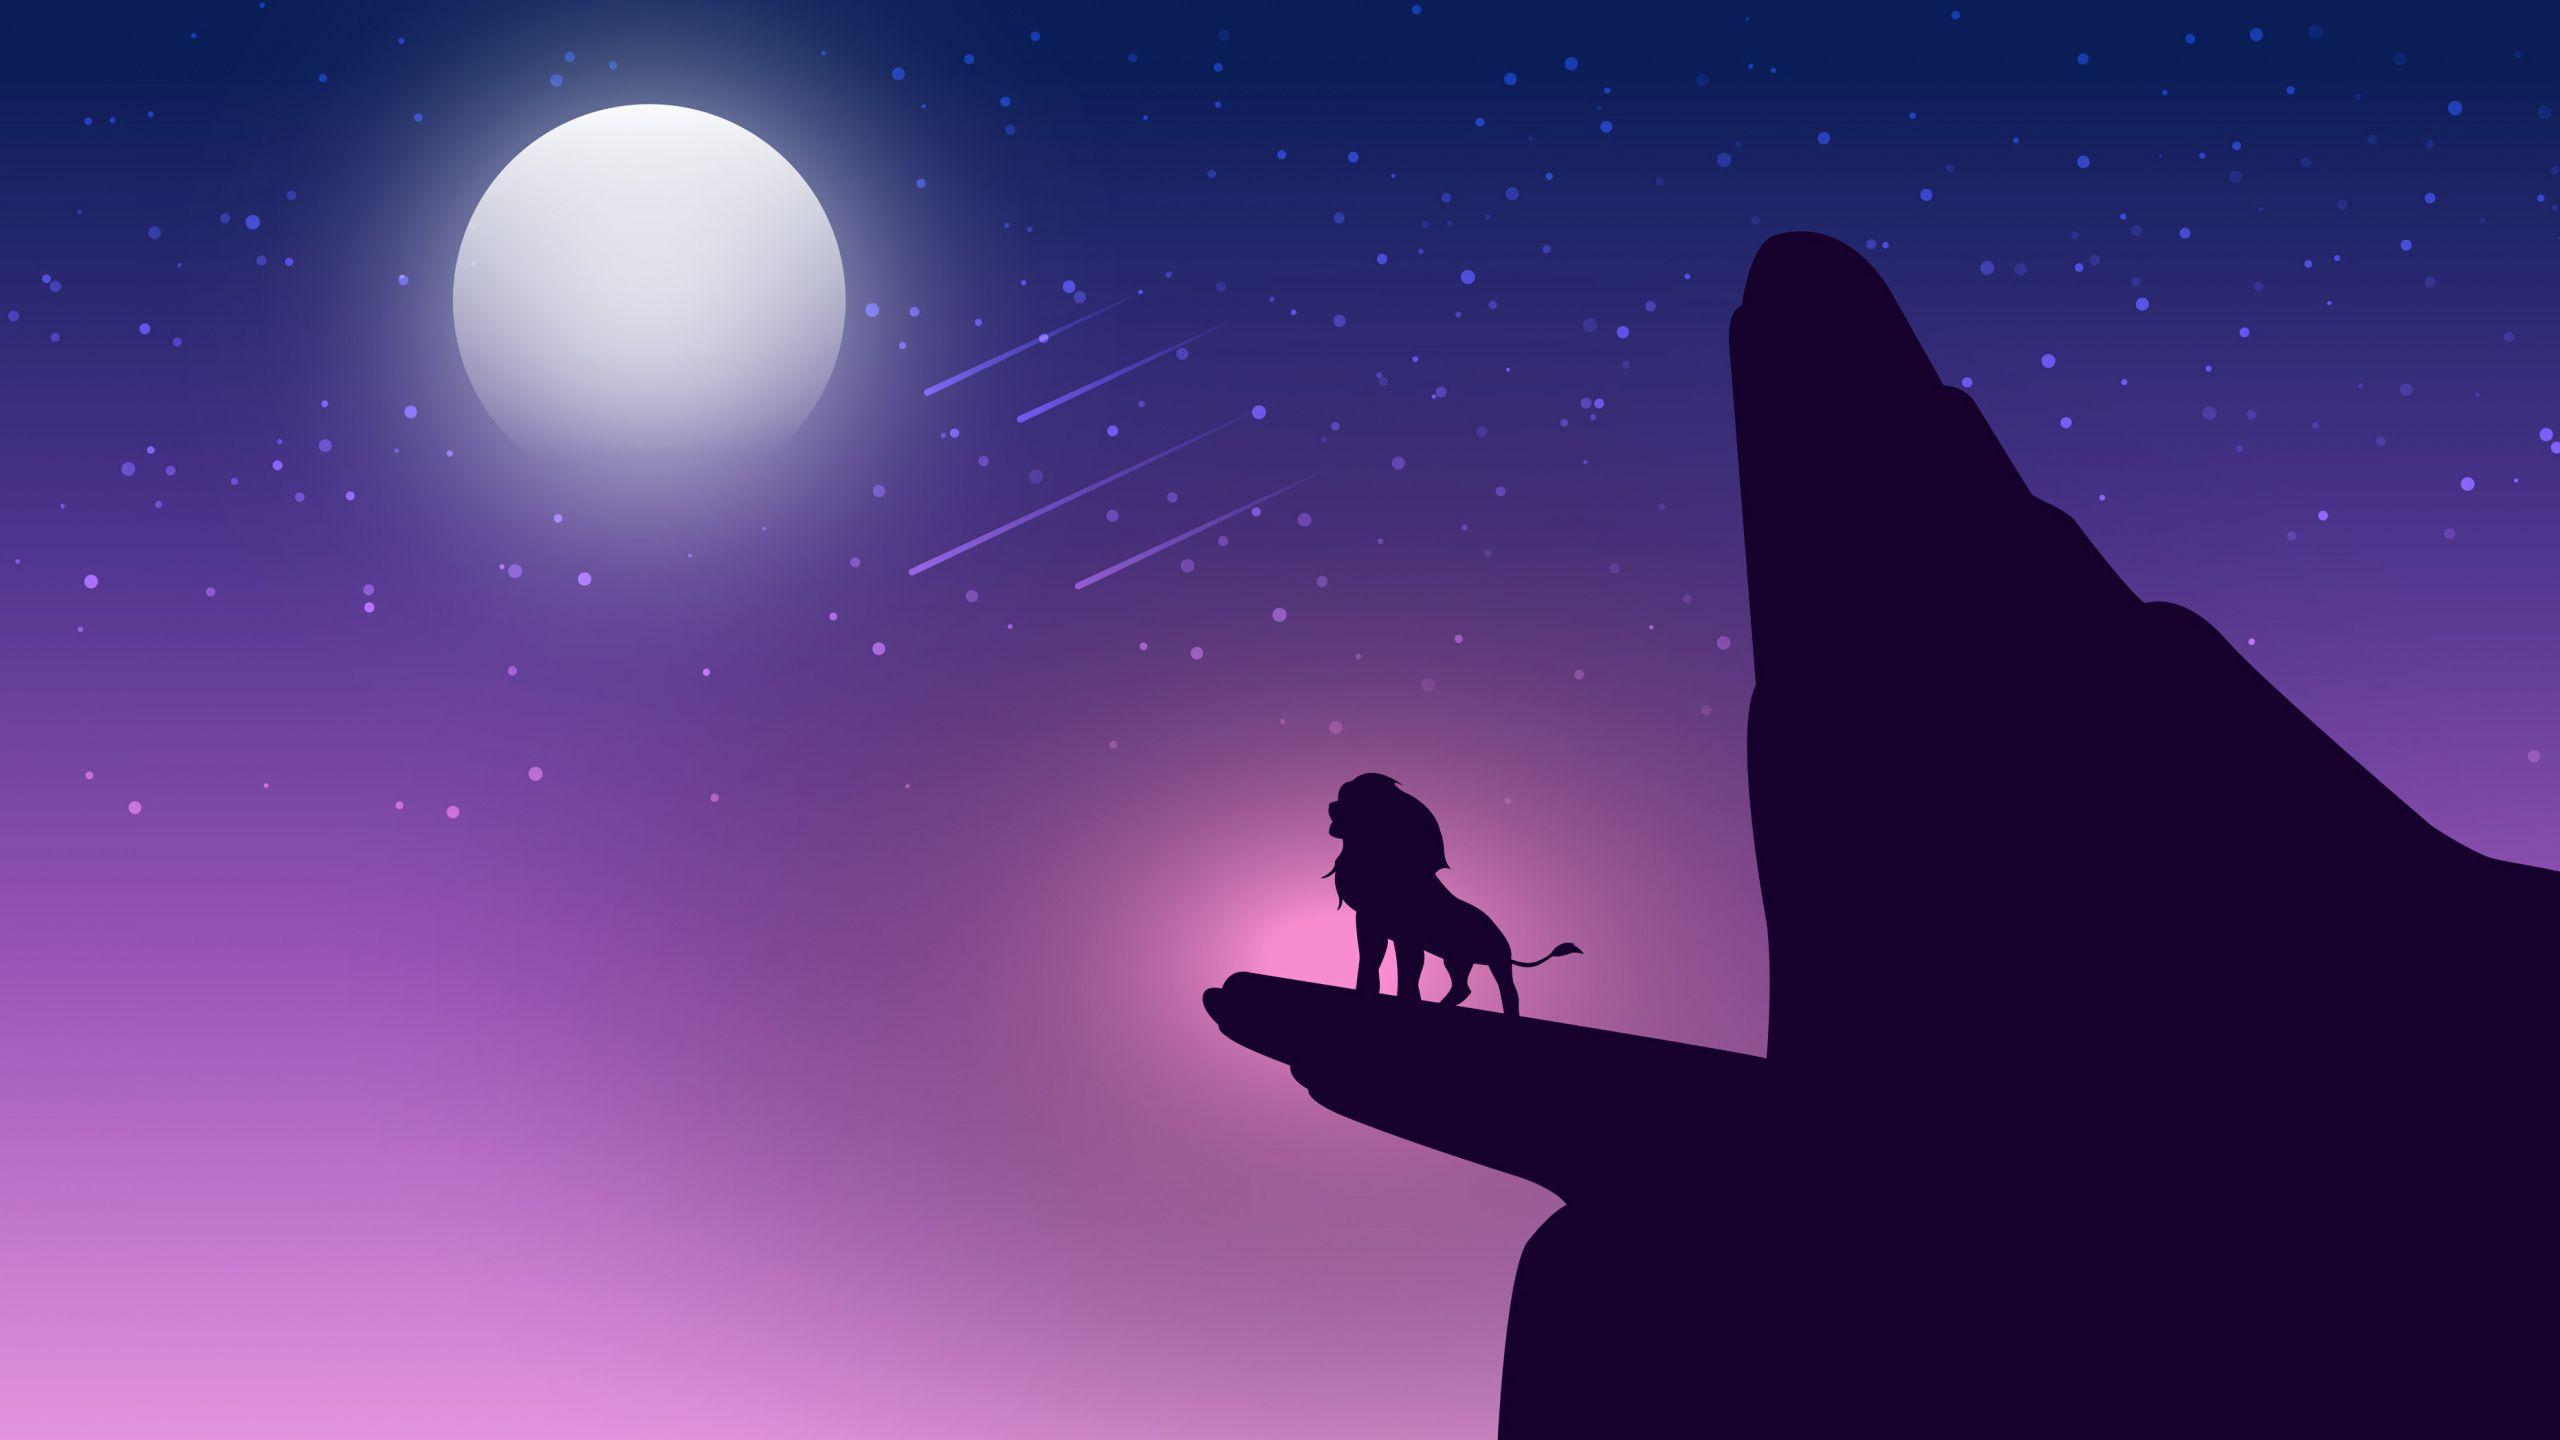 2560x1440 Night Lion King Simba Minimal Silhouette Art